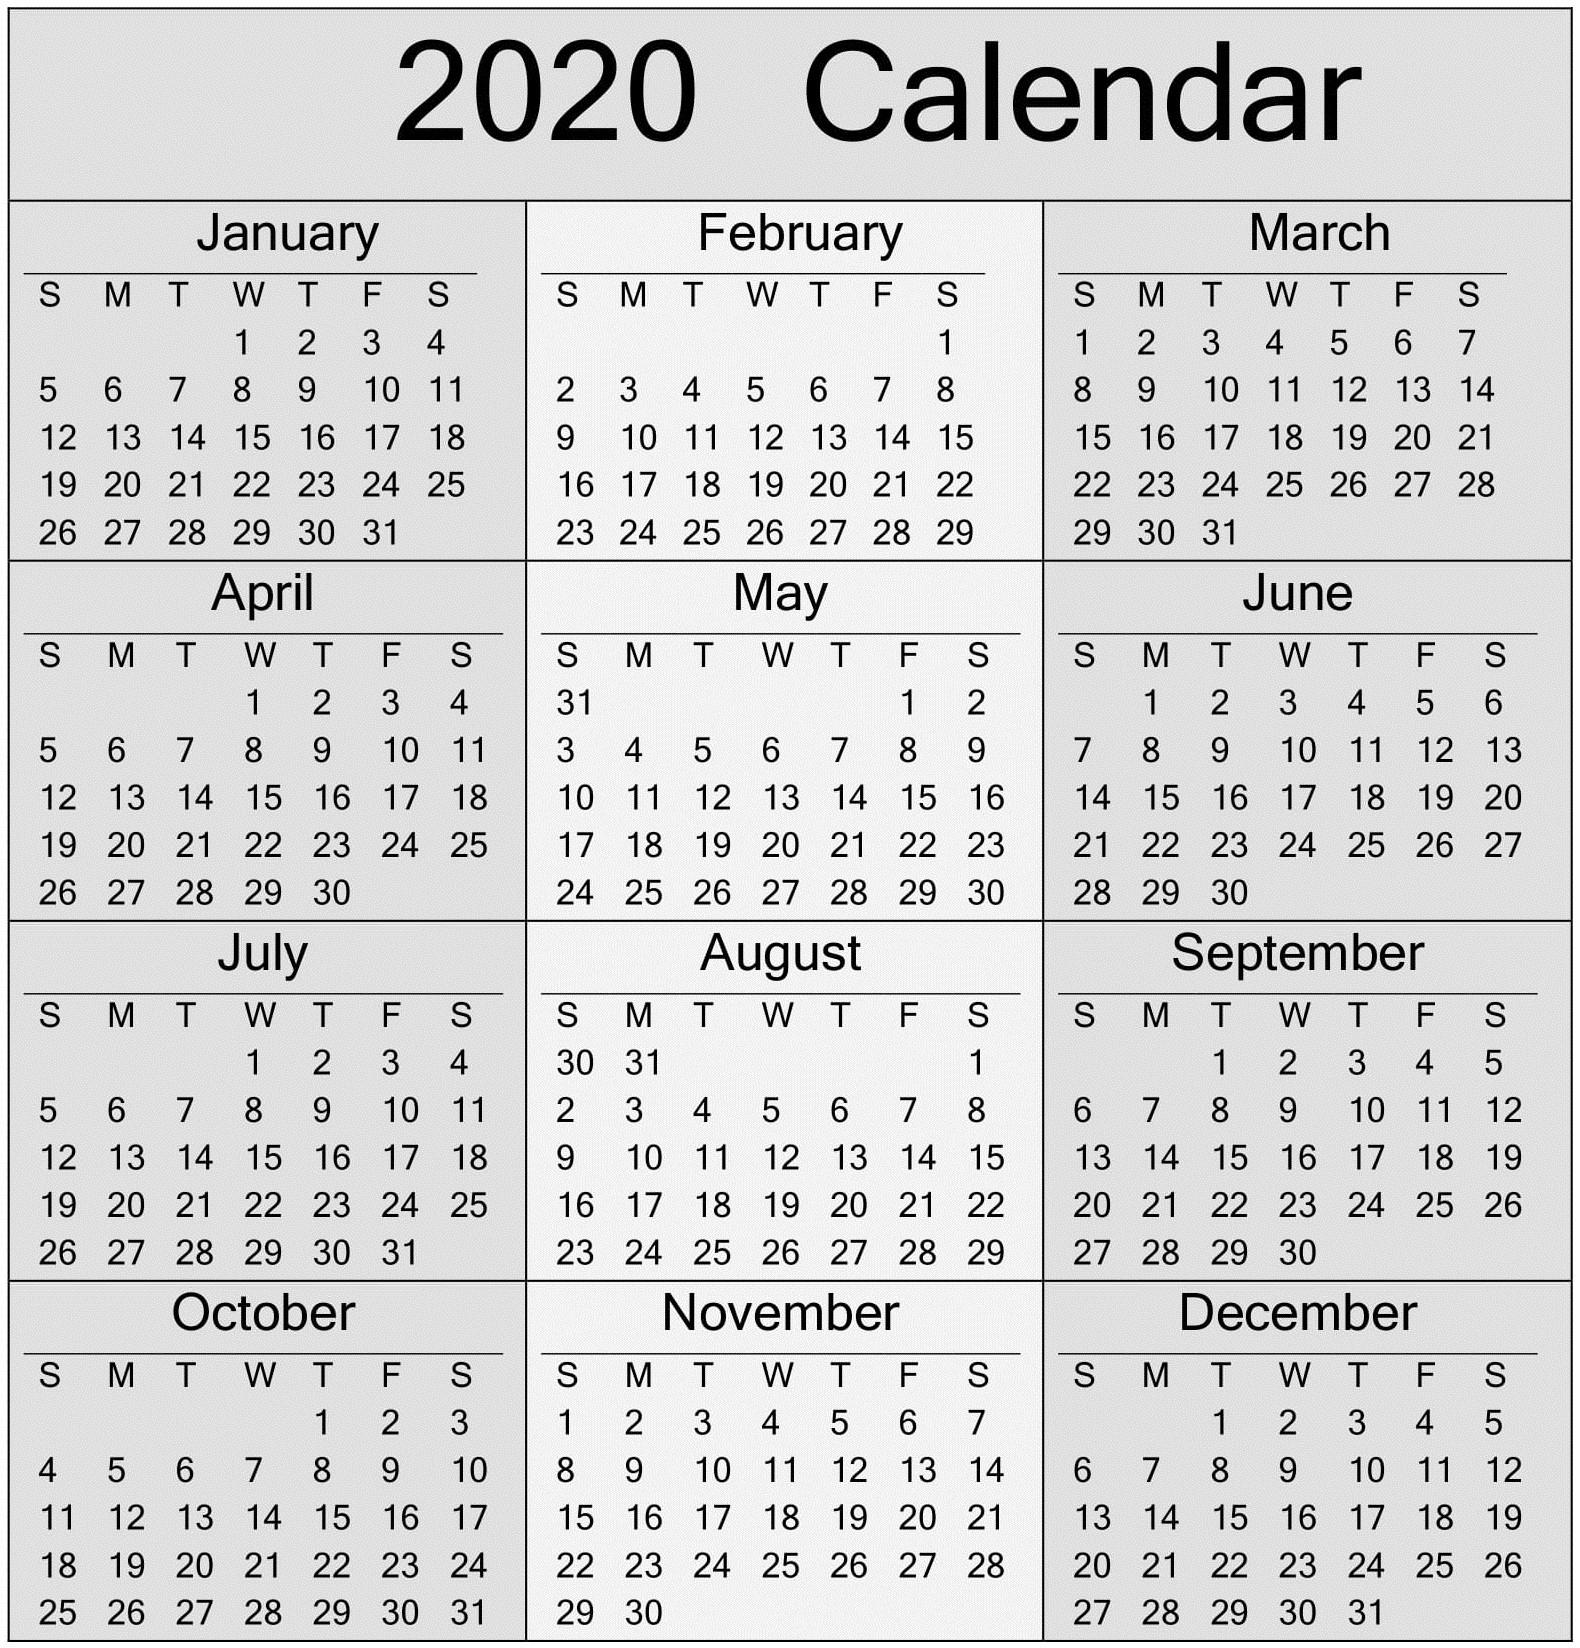 Free Printable Yearly 2020 Calendar And Holiday Templates  2020 Calendar Printable